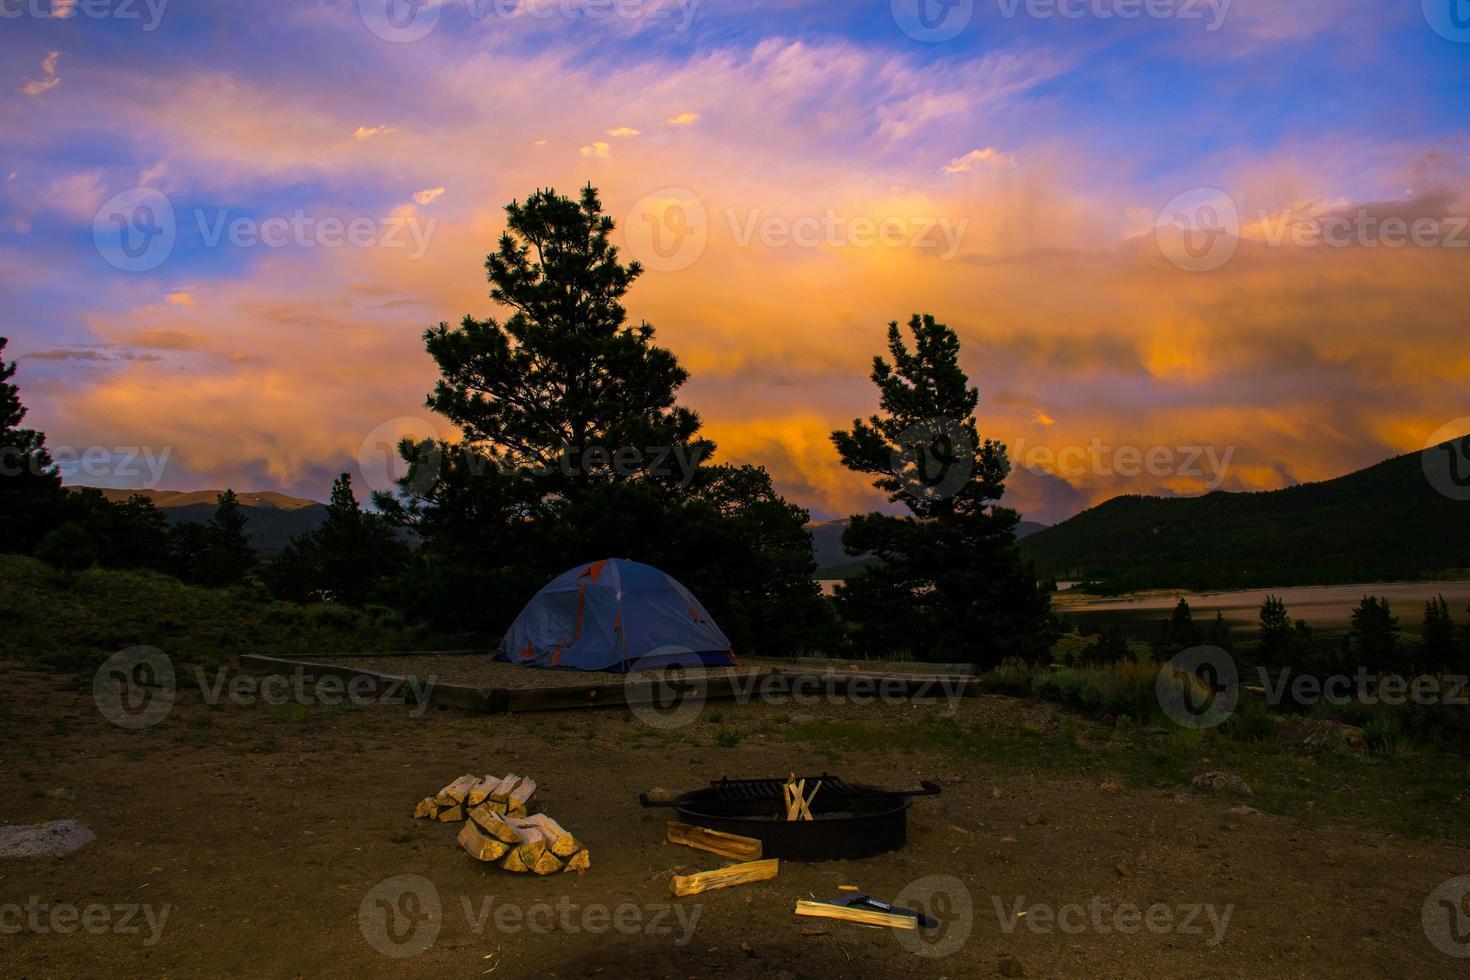 kampvuur zonsondergang in de verbazingwekkende rotsachtige bergen foto